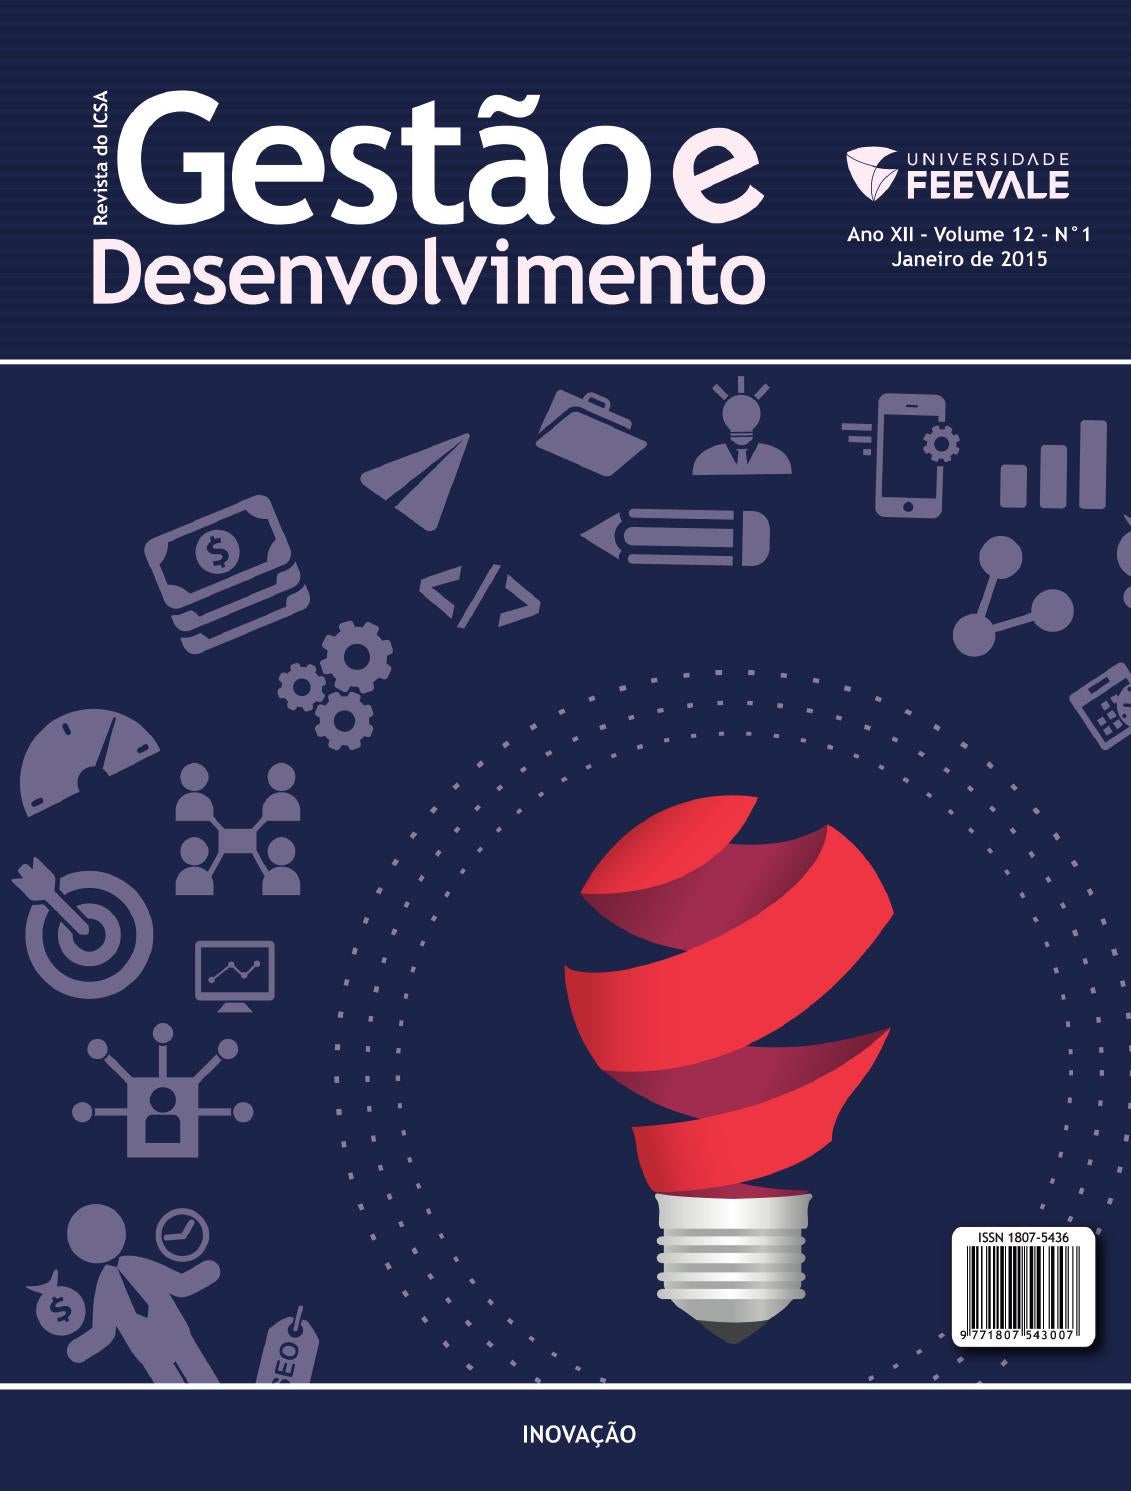 Revista gesto e desenvolvimento janeiro 2015 by universidade revista gesto e desenvolvimento janeiro 2015 by universidade feevale issuu fandeluxe Choice Image